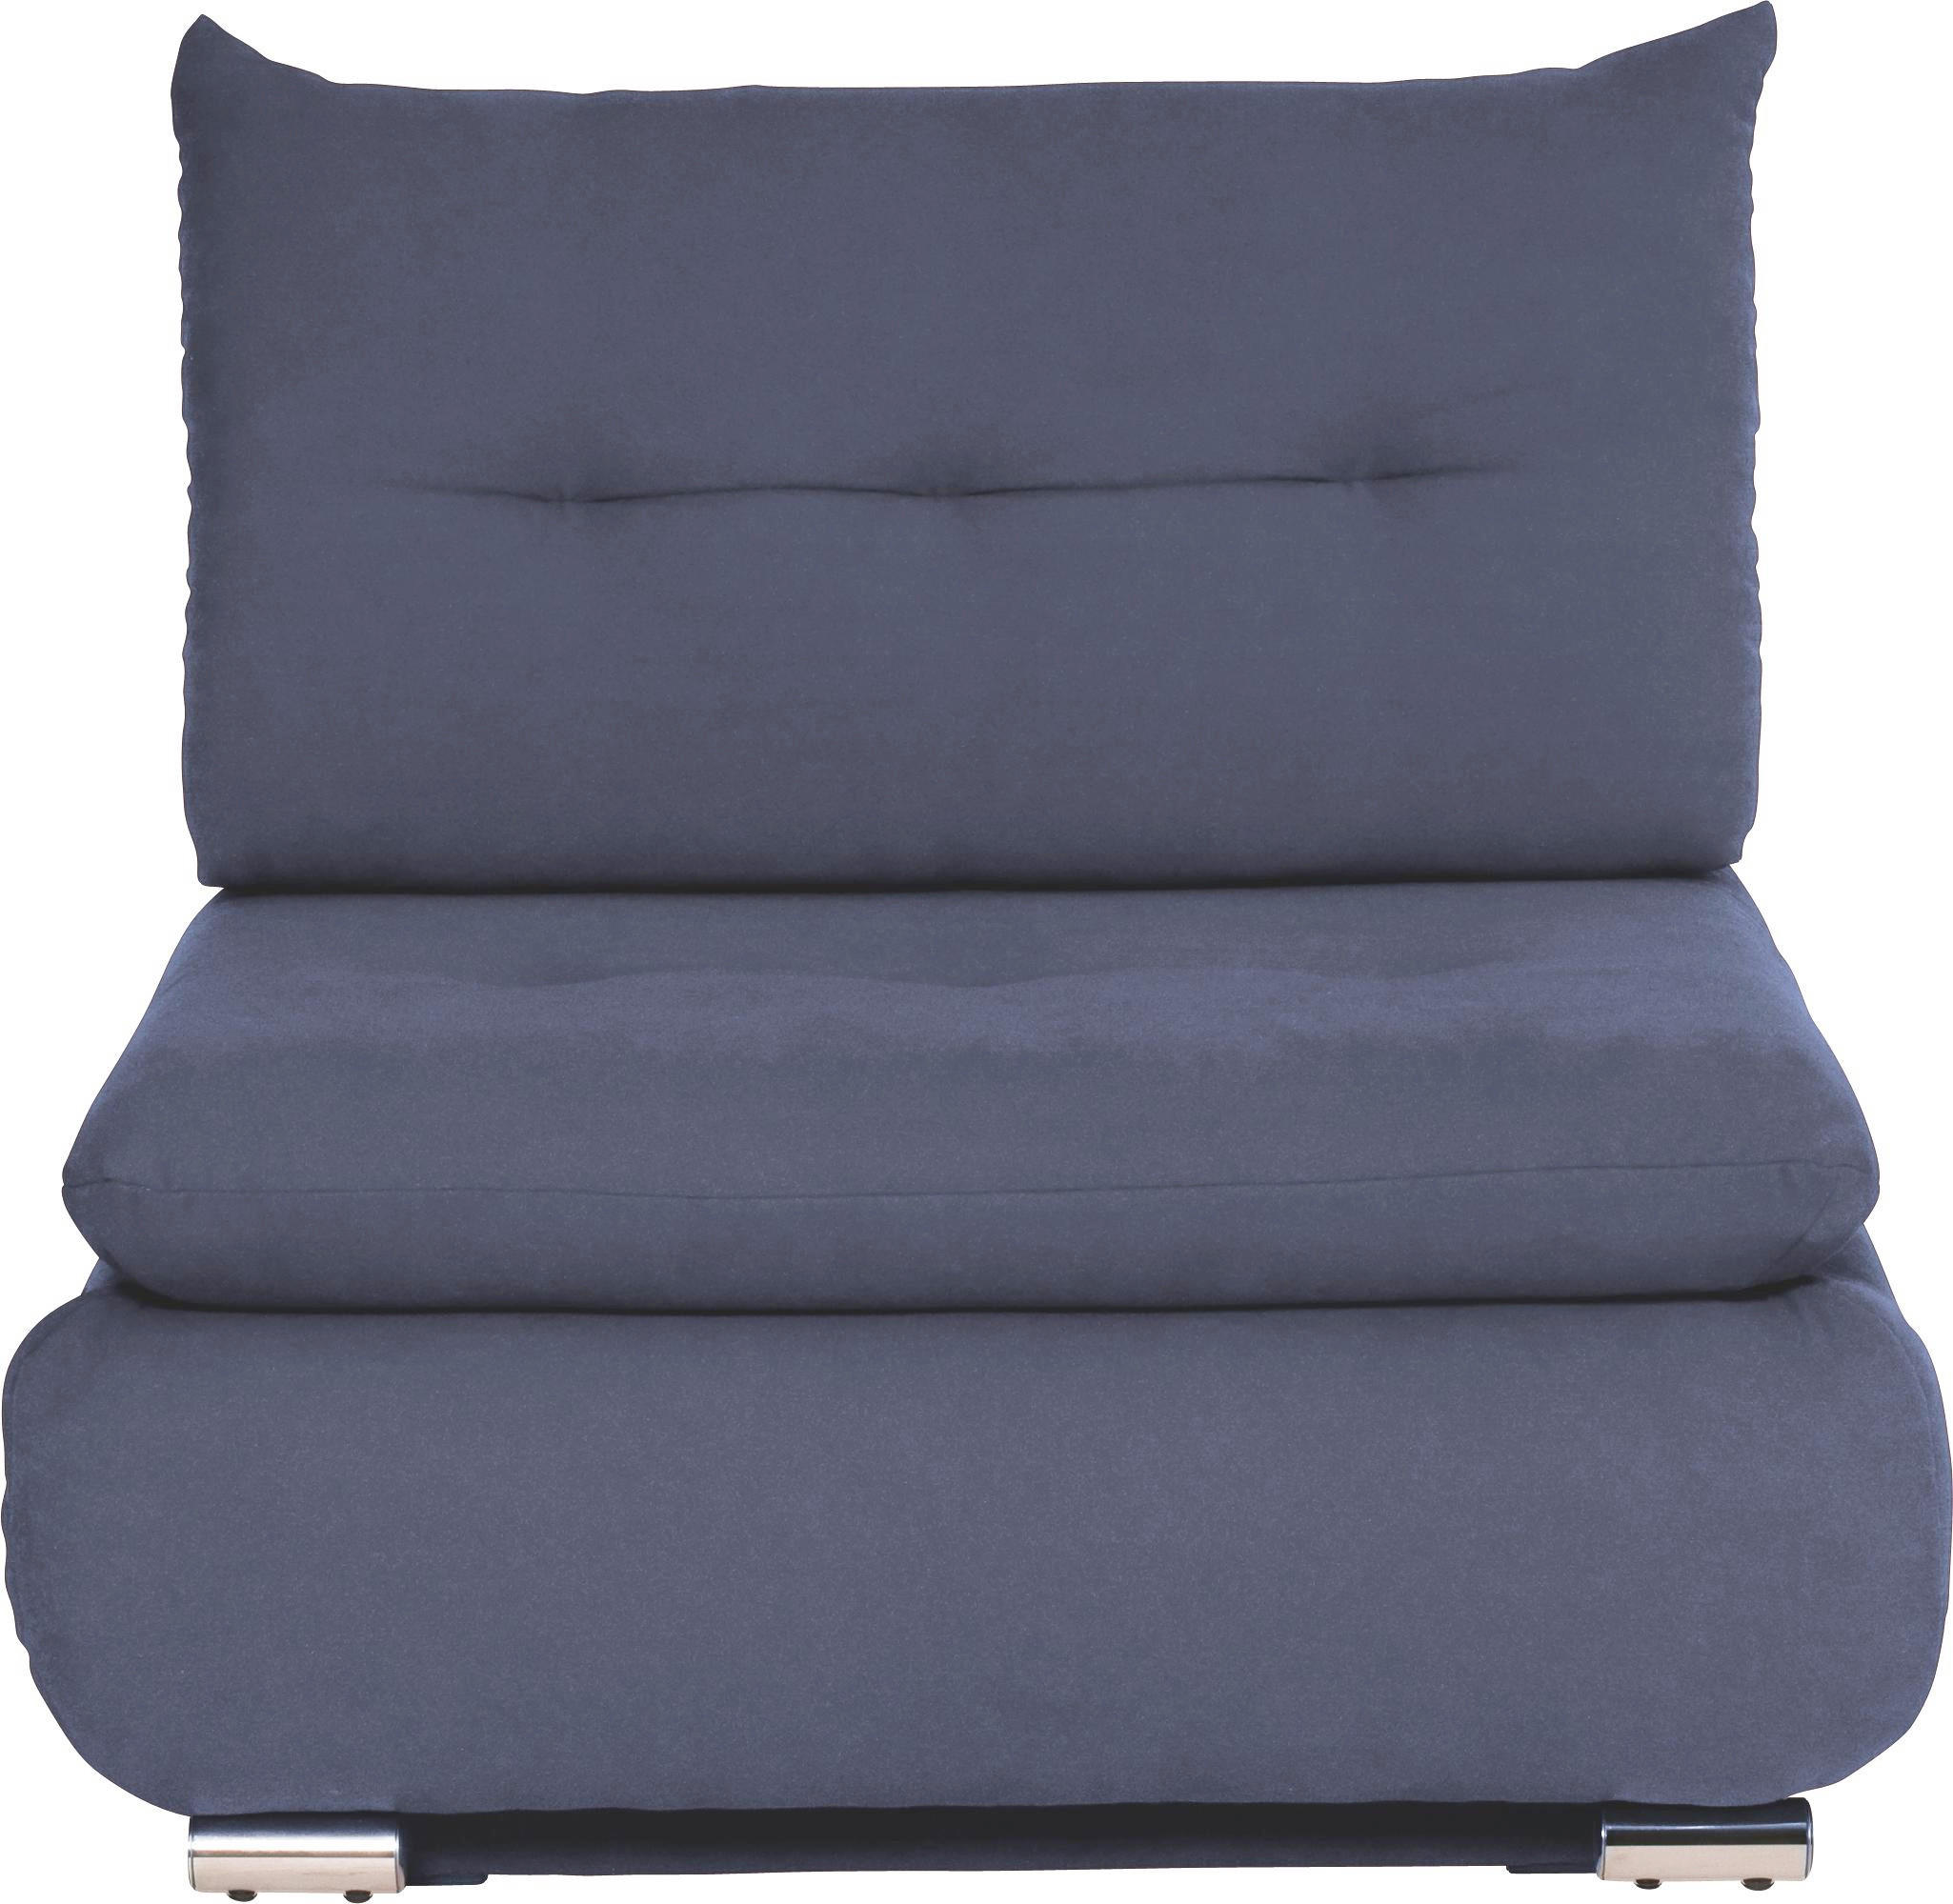 klappsessel zum schlafen klappsessel zum schlafen with klappsessel zum schlafen amazing. Black Bedroom Furniture Sets. Home Design Ideas